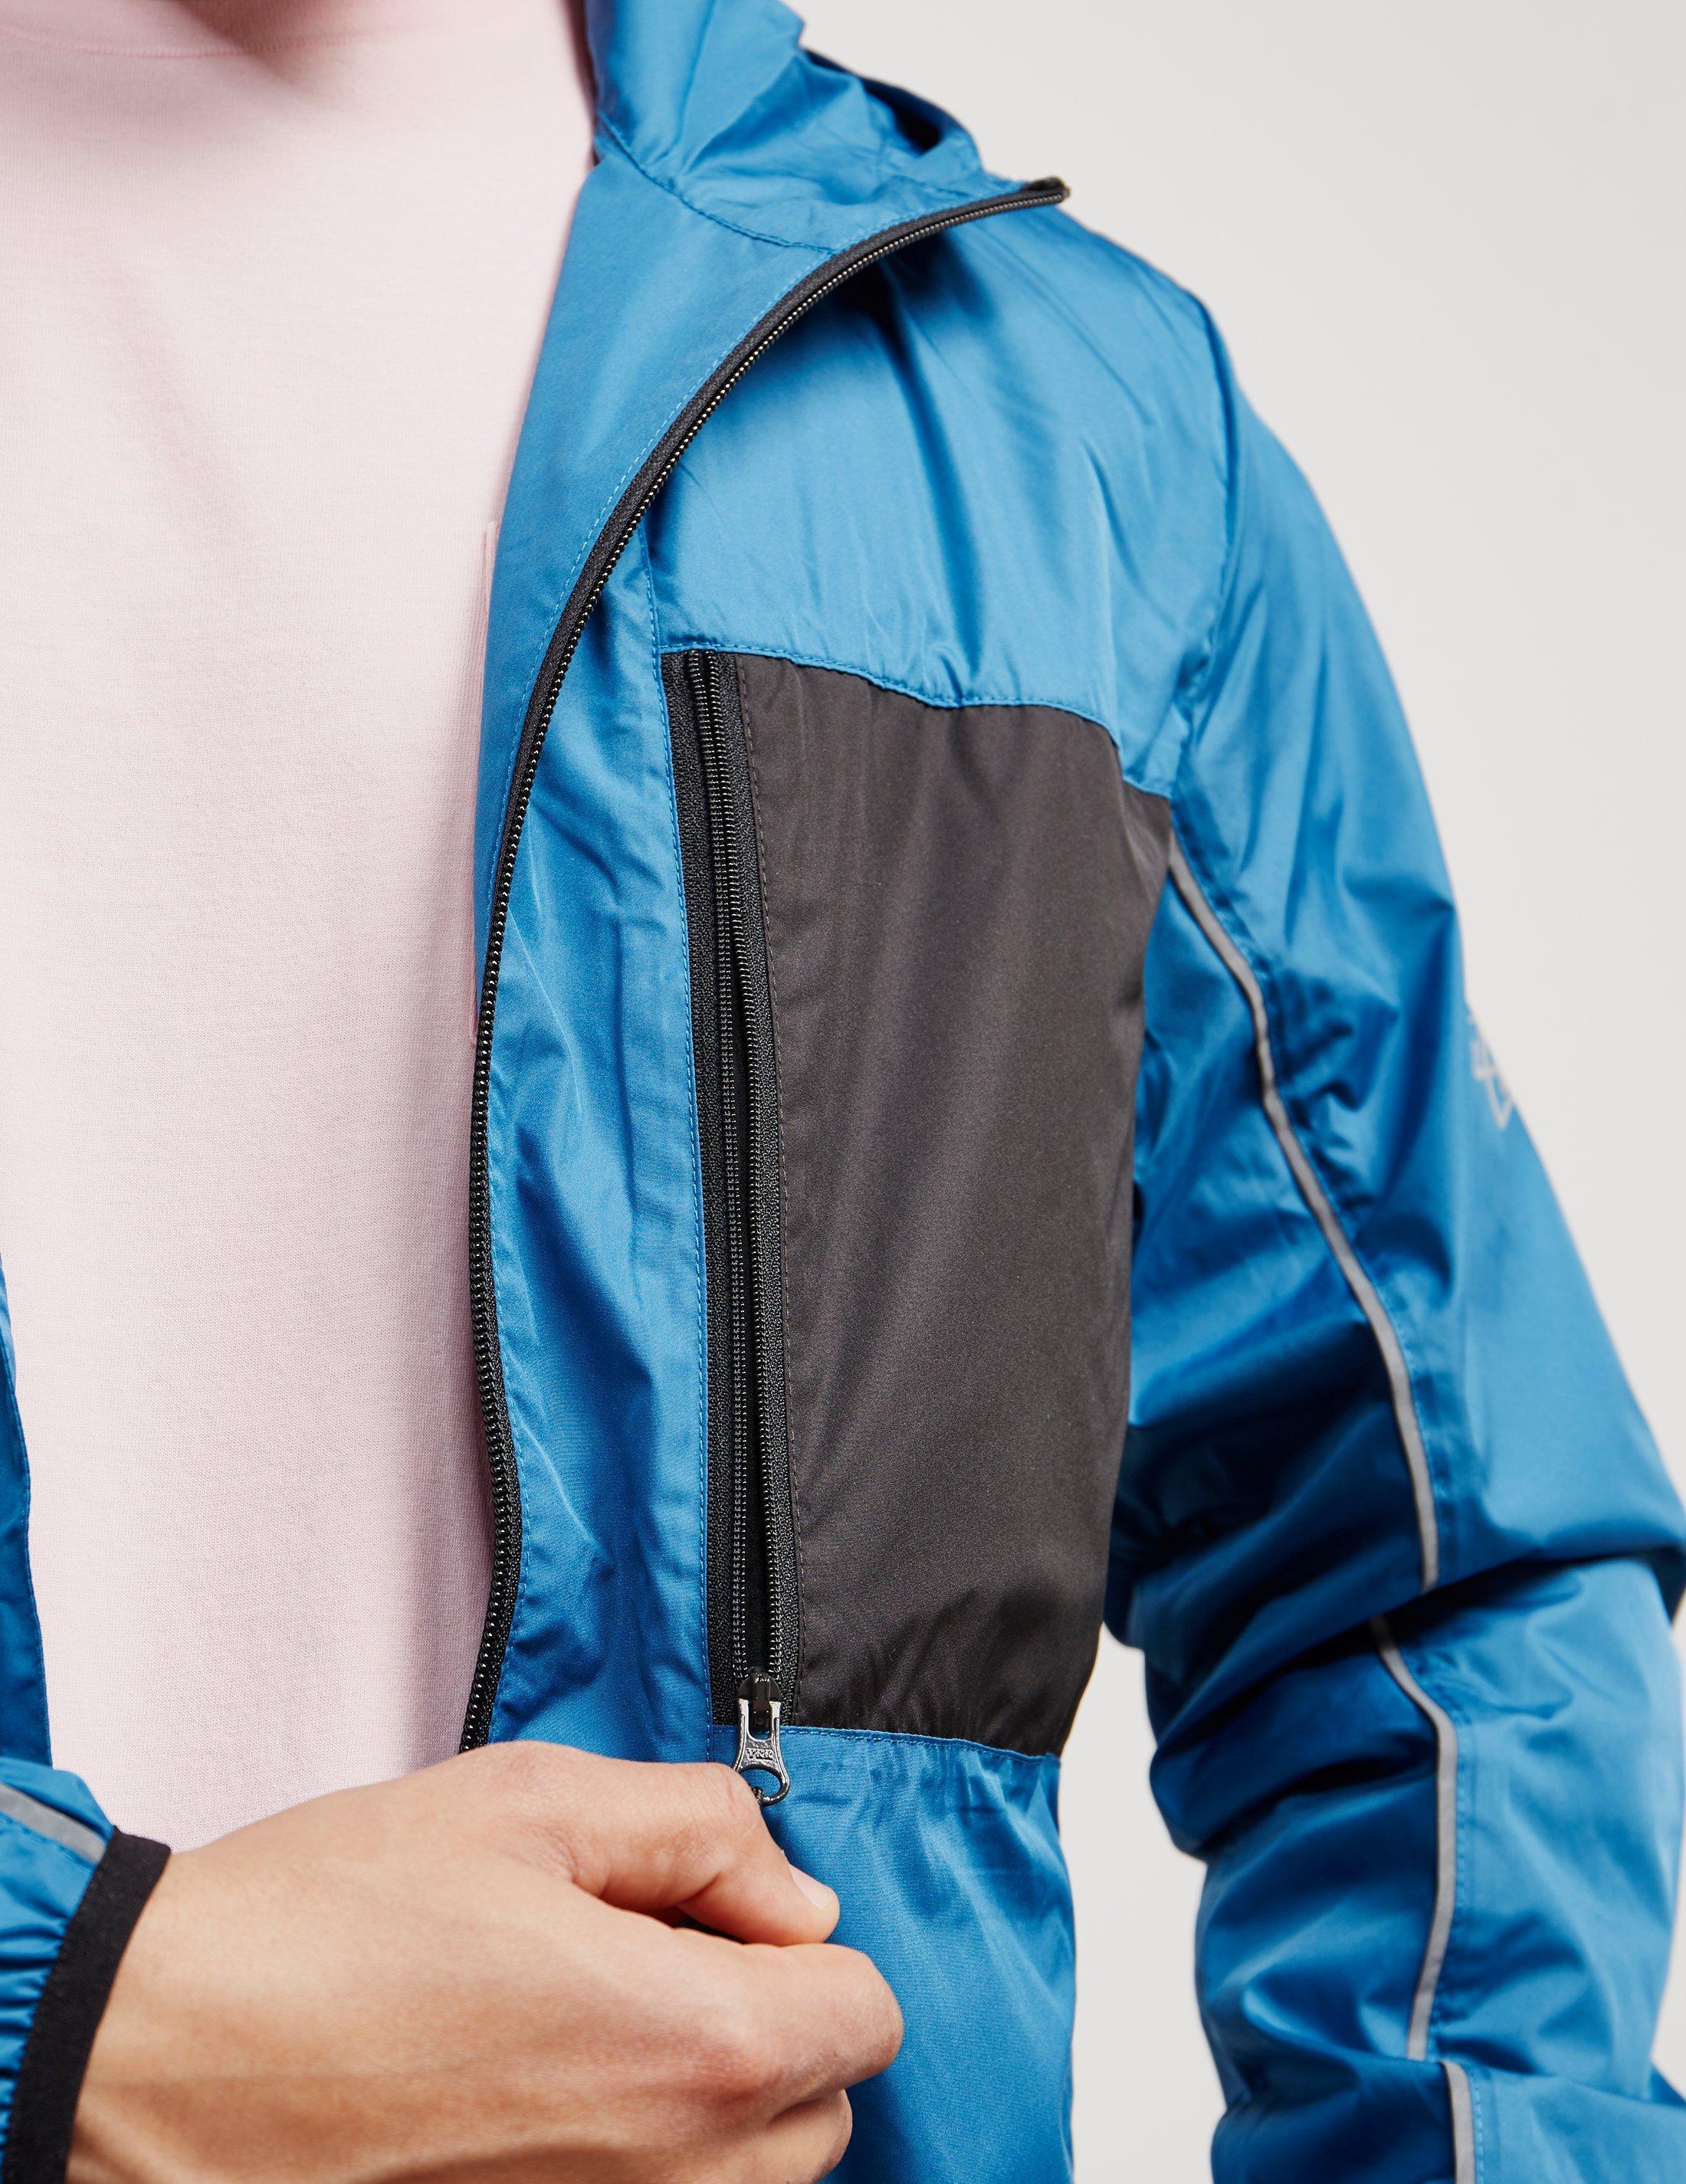 5b2da0f4081b5 Stussy Reflective Lightweight Jacket - Online Exclusive Blue in Blue for Men  - Save 51% - Lyst